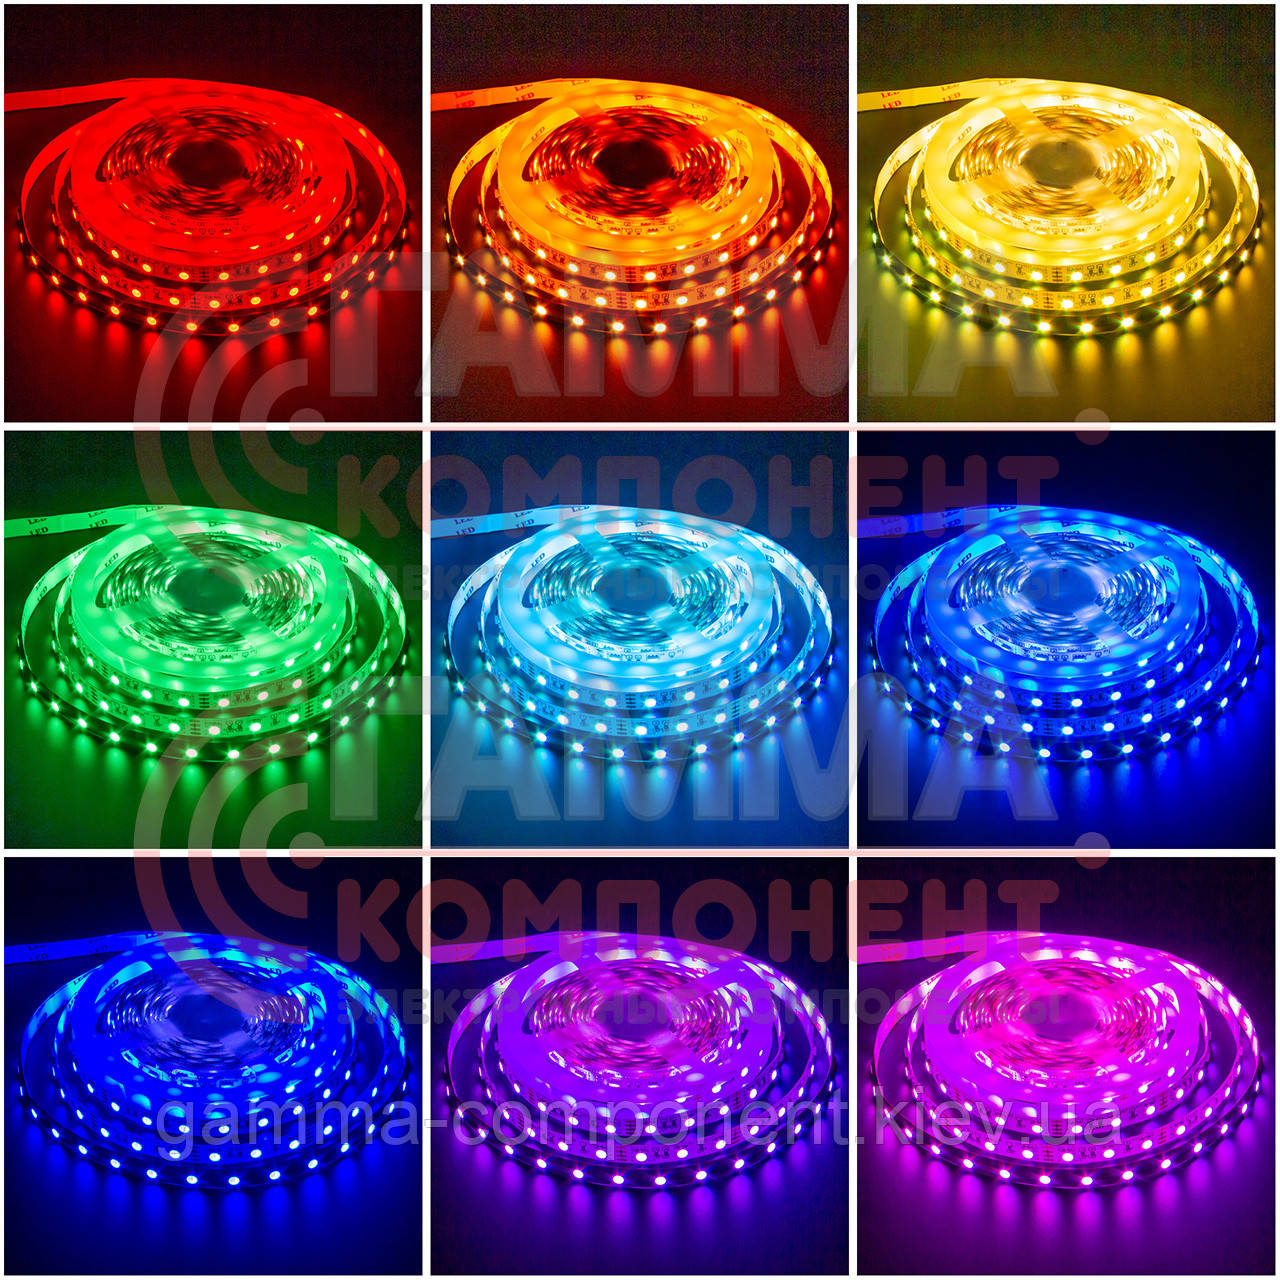 Светодиодная лента RGB SMD 5050 (30 LED/м), IP20, 12В - бобины от 5 метров